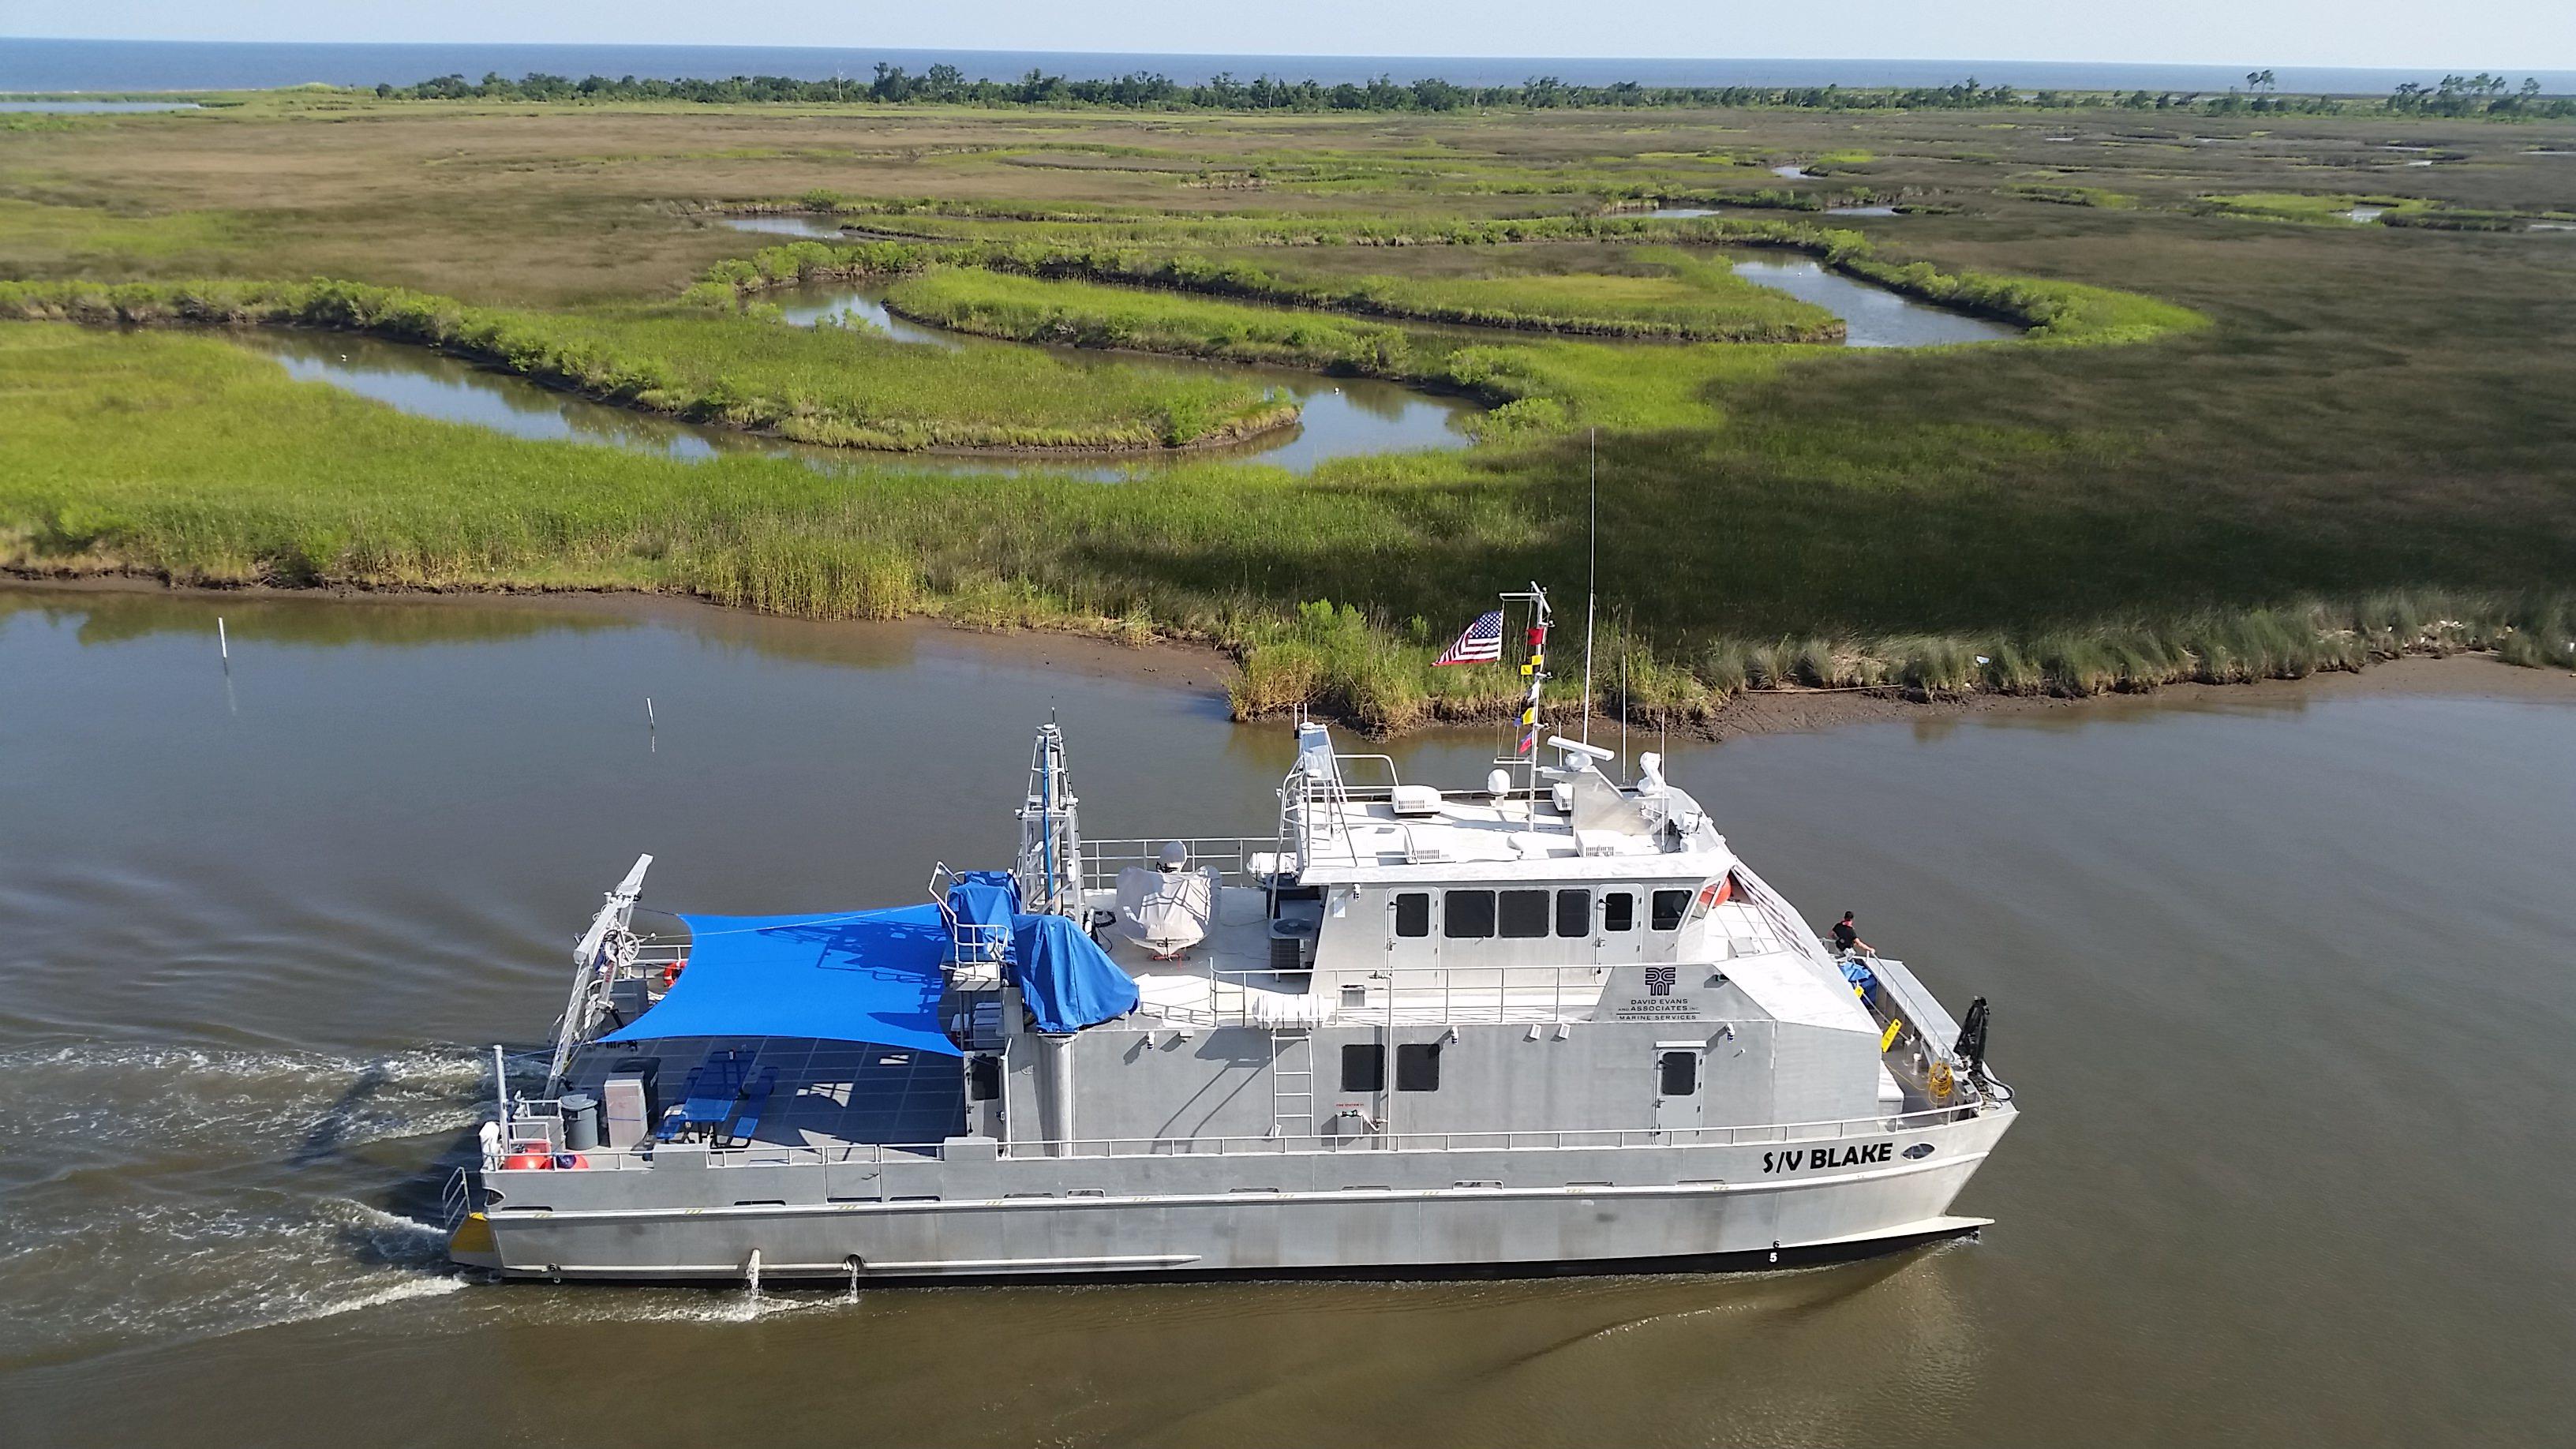 The Blake survey vessel